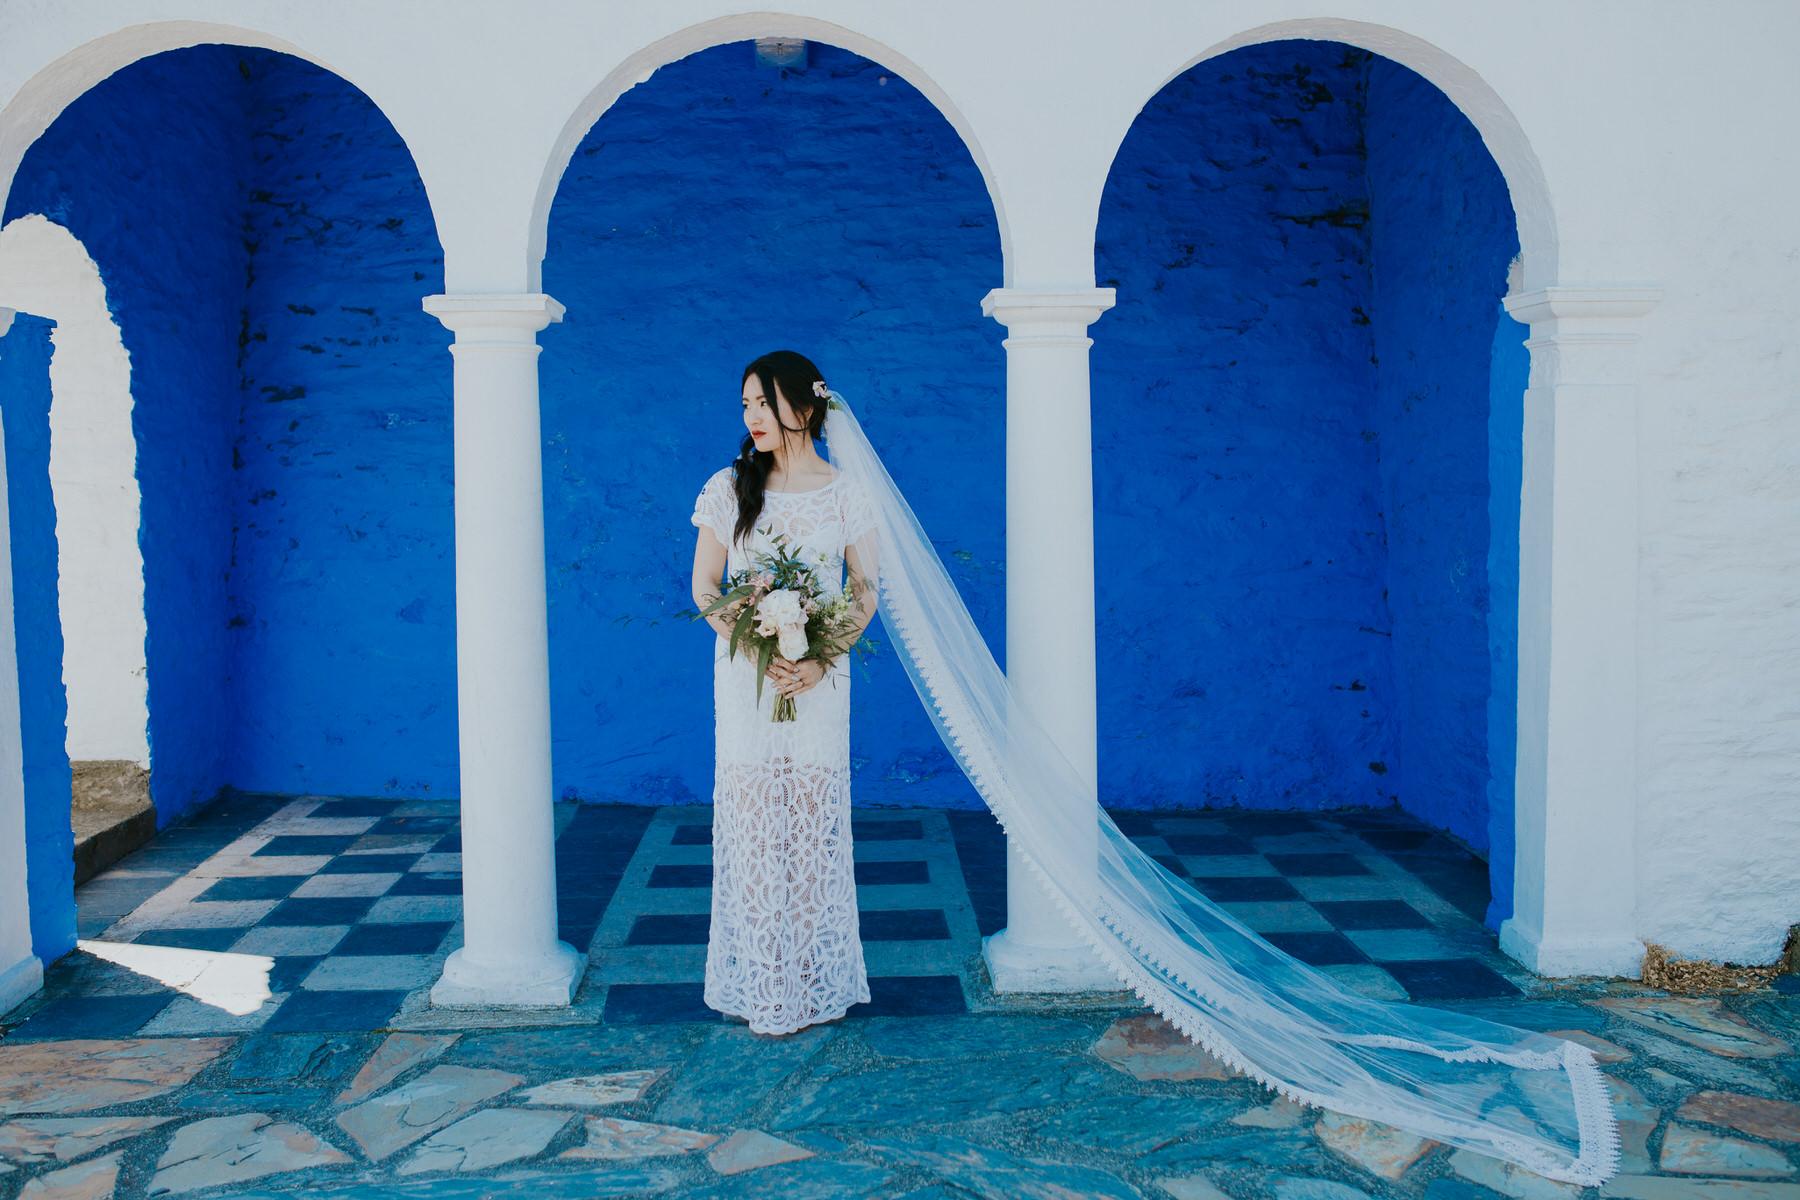 629 bride Shaina wedding portrait Portmeirion.jpg